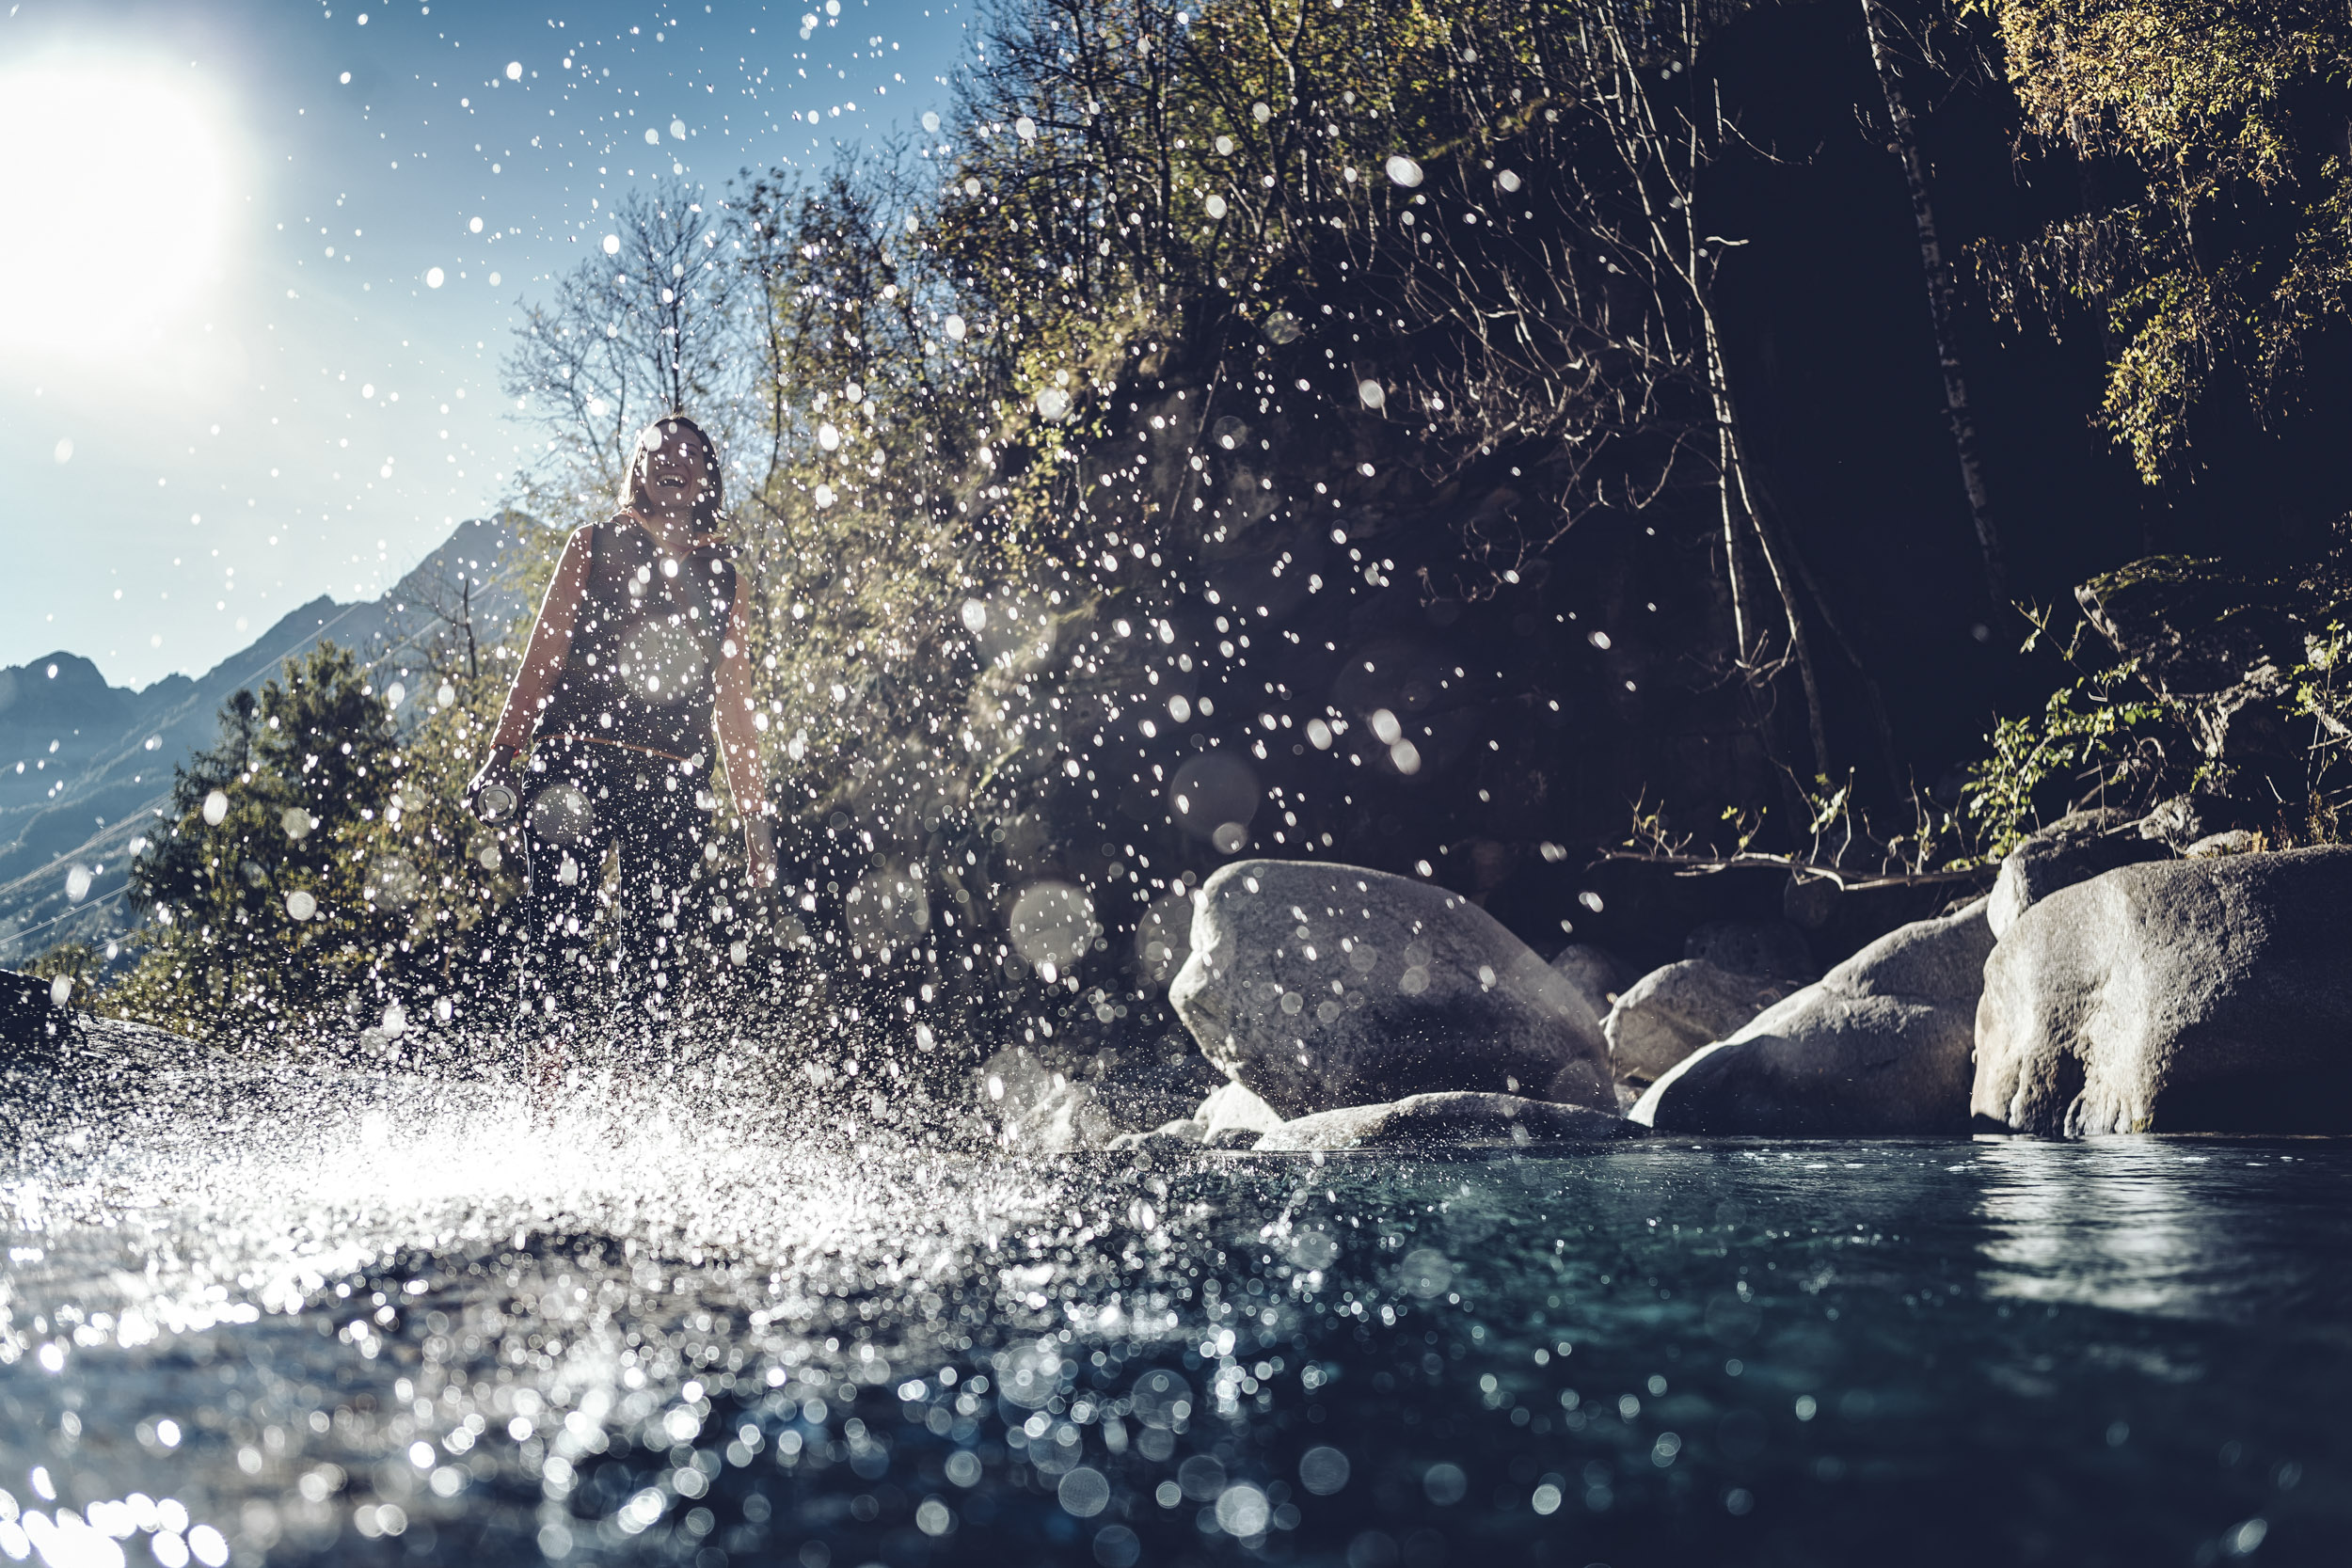 2019-SeifertUebler-luqel-outdoor-mountain-lifestyle007.jpg